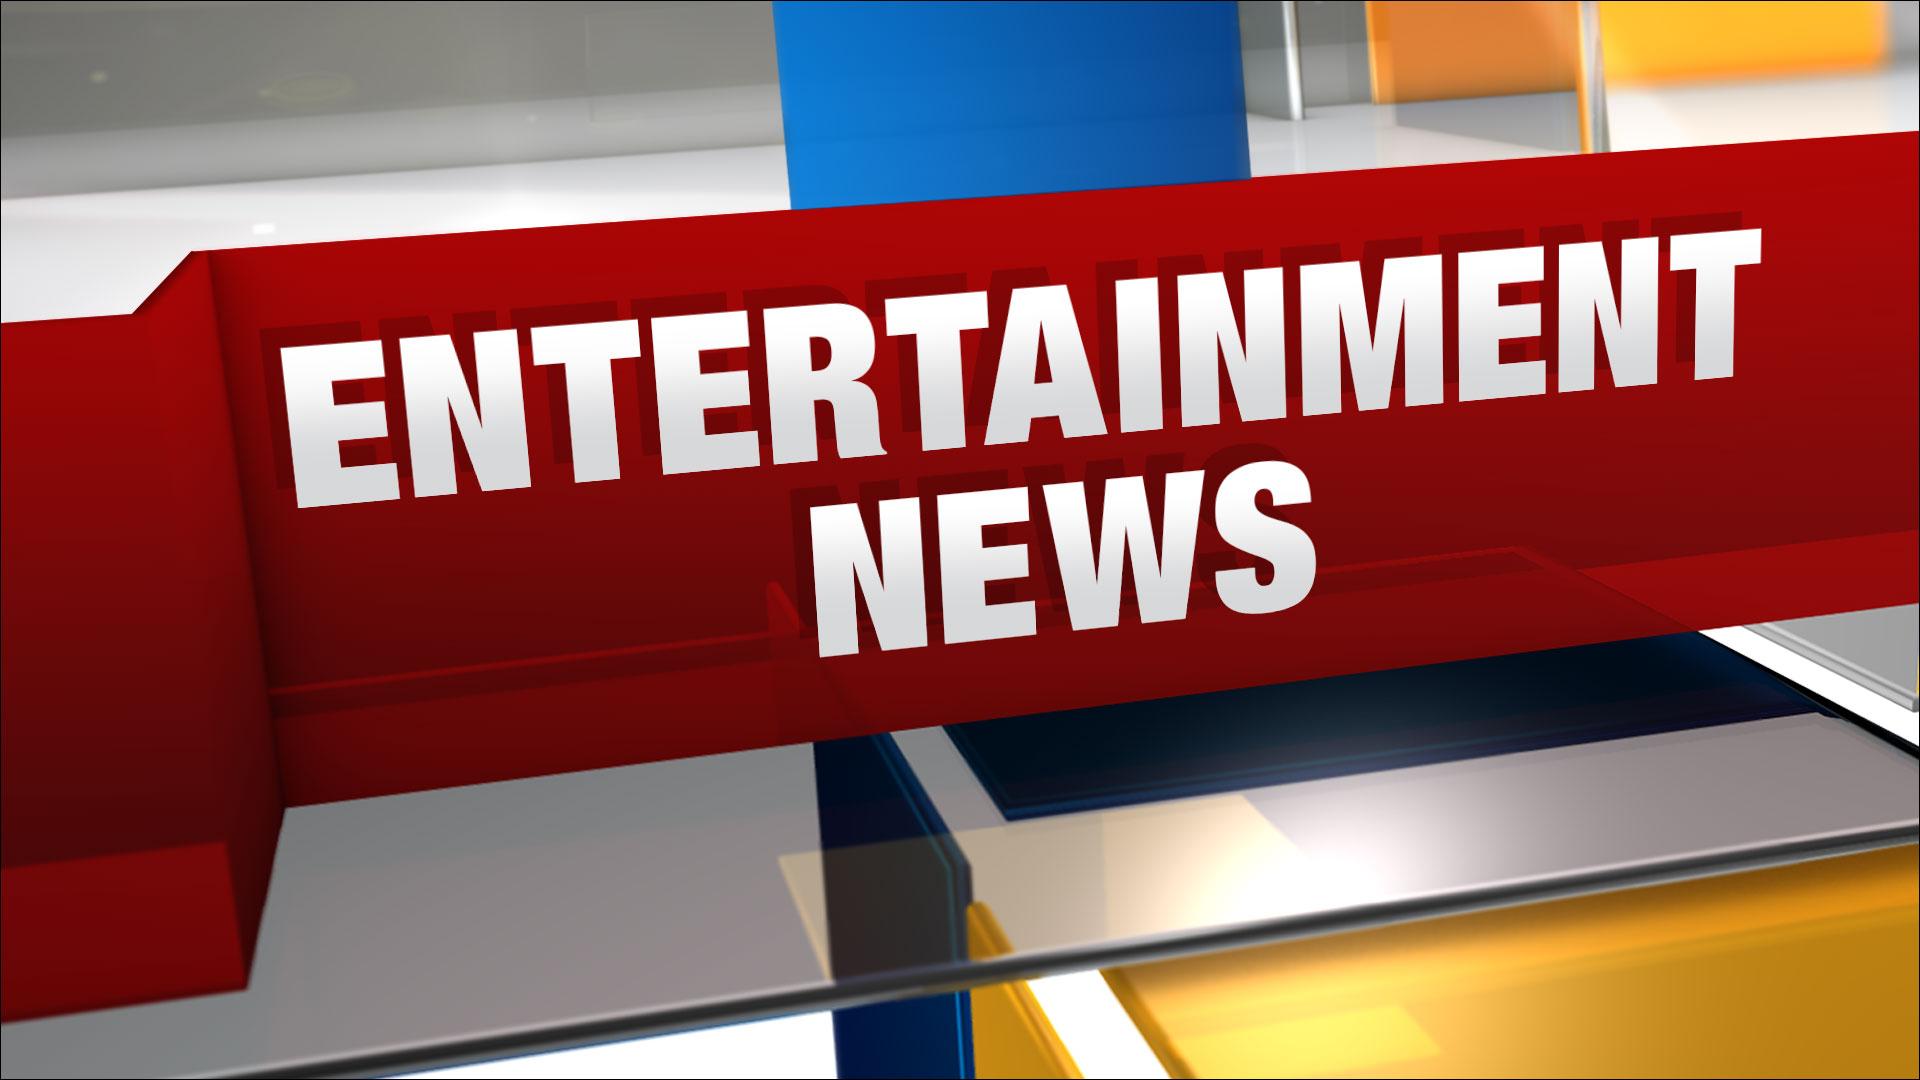 Entertainment News Generic